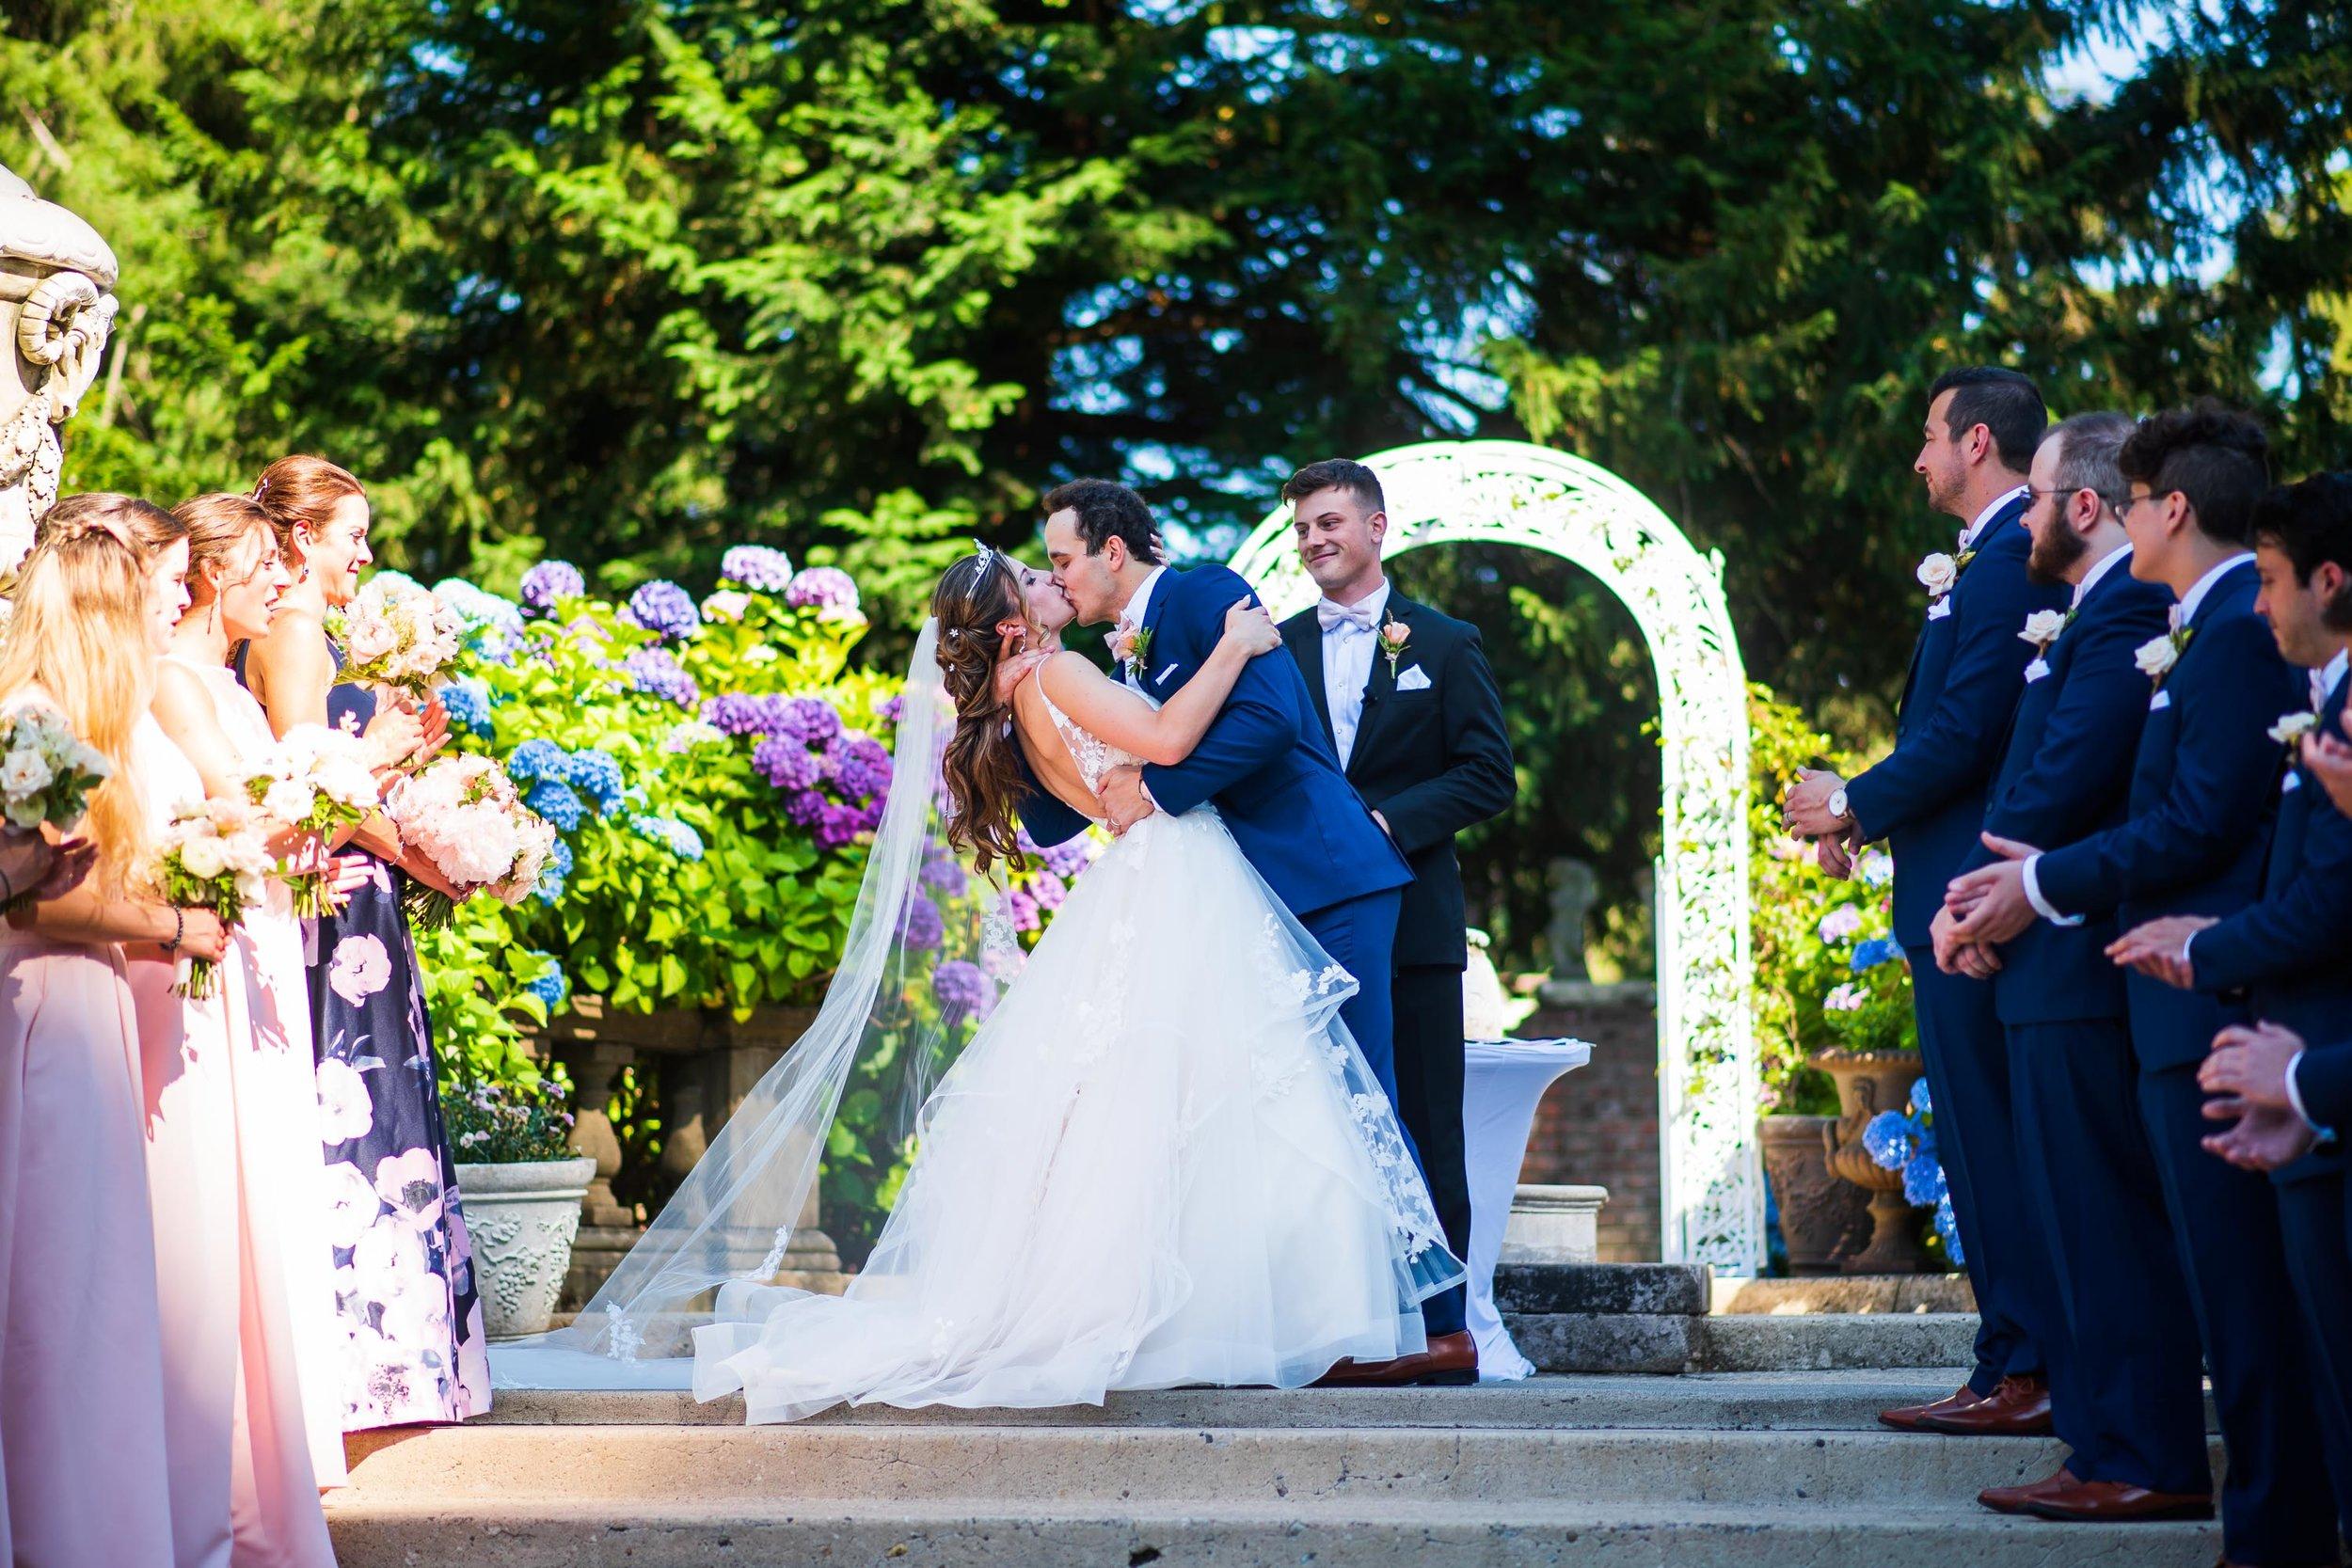 thornewood castle wedding 51.jpg